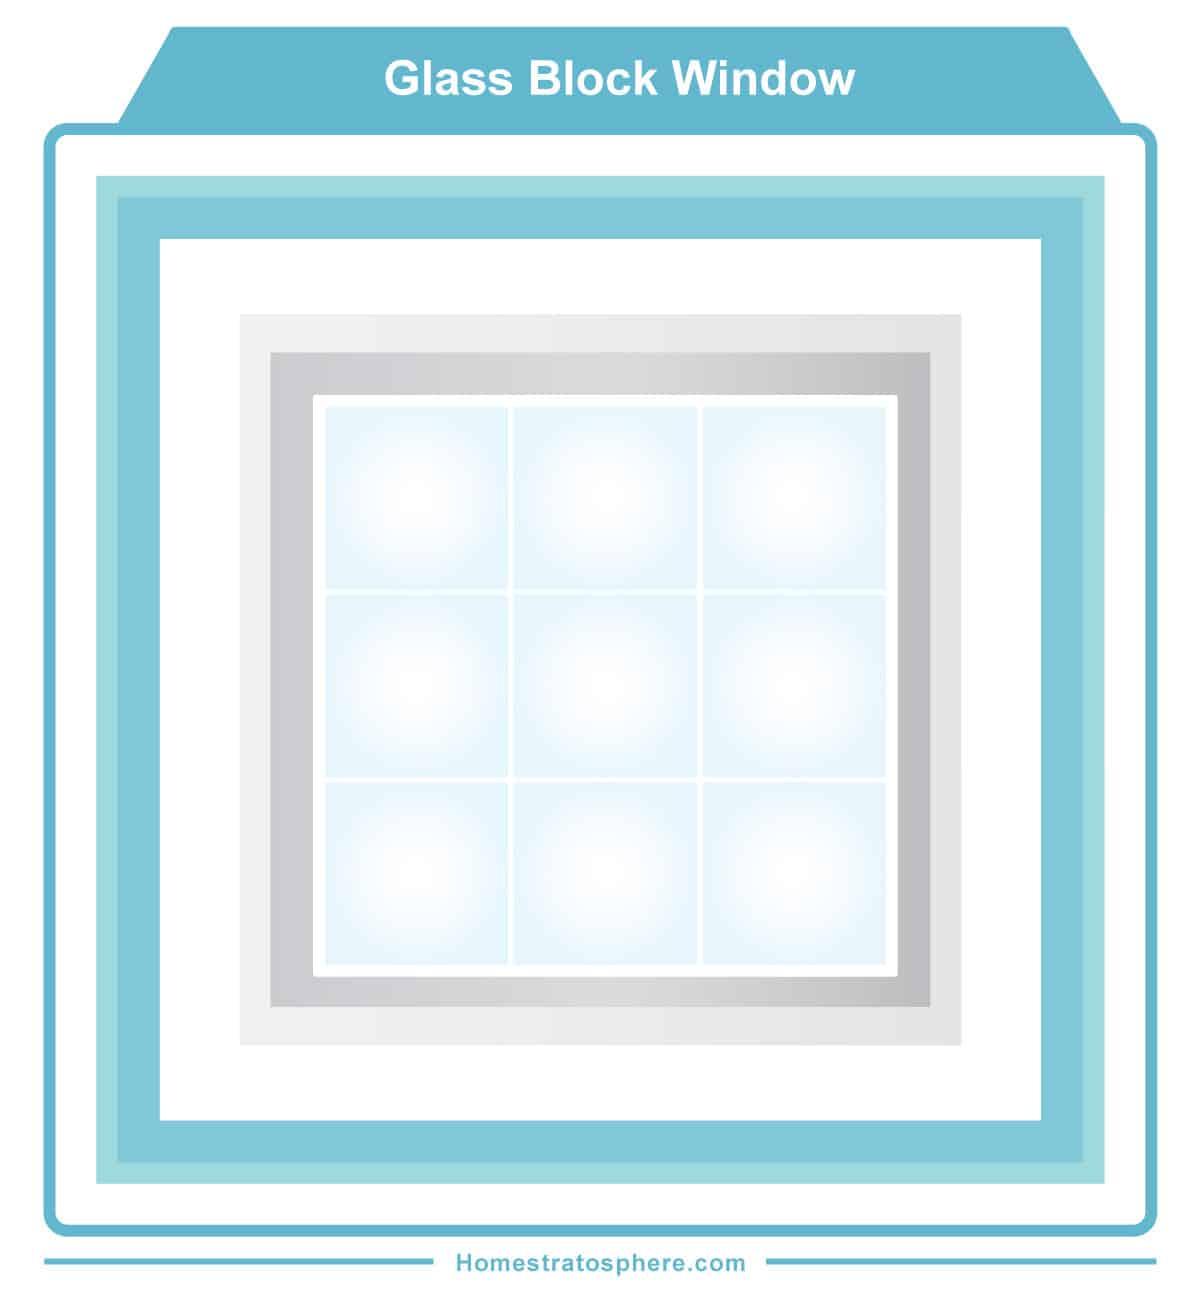 Glass Block Window diagram